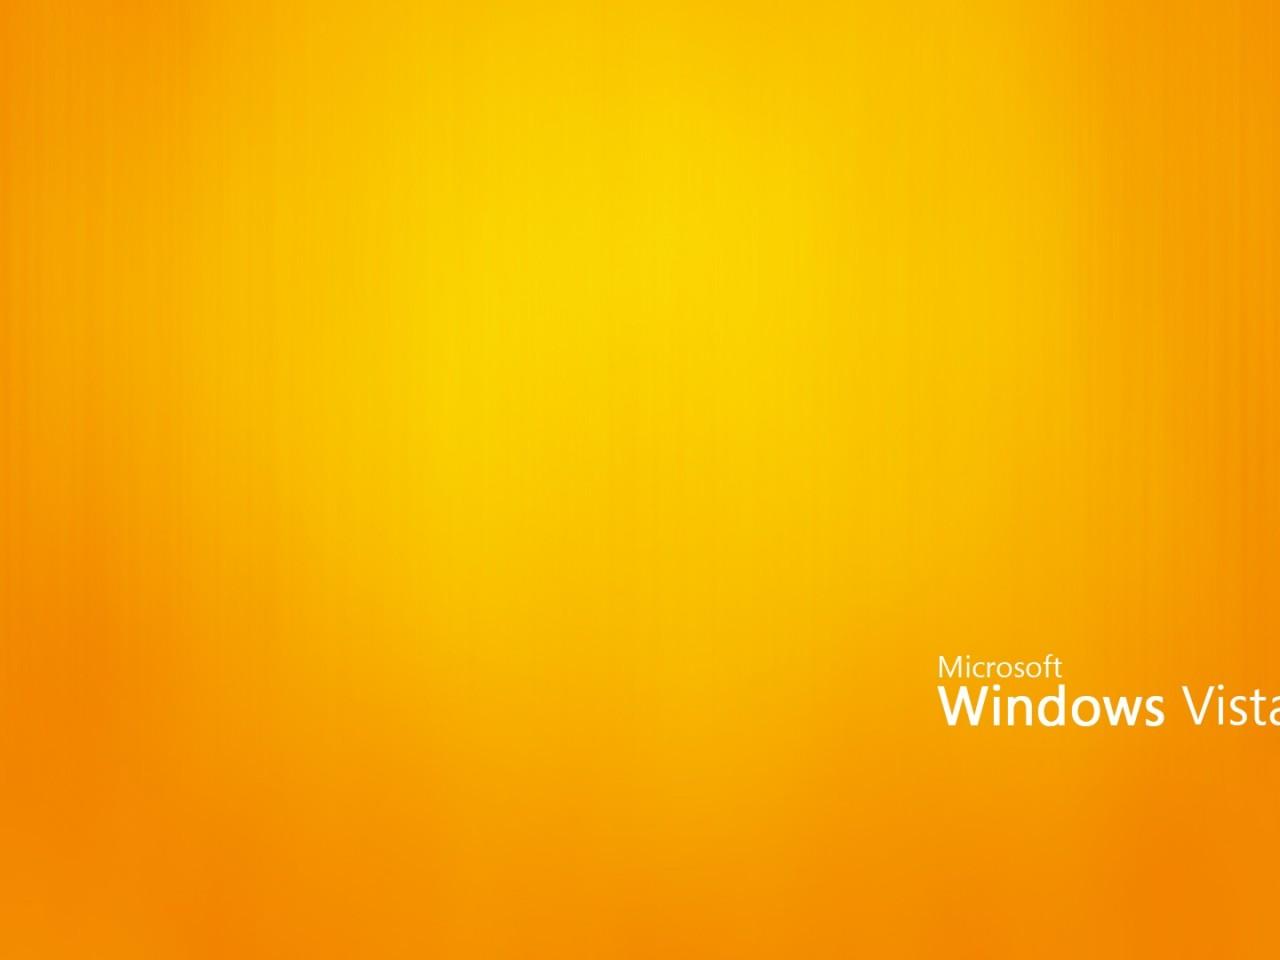 Download orange windows vista wallpaper HD wallpaper 1280x960